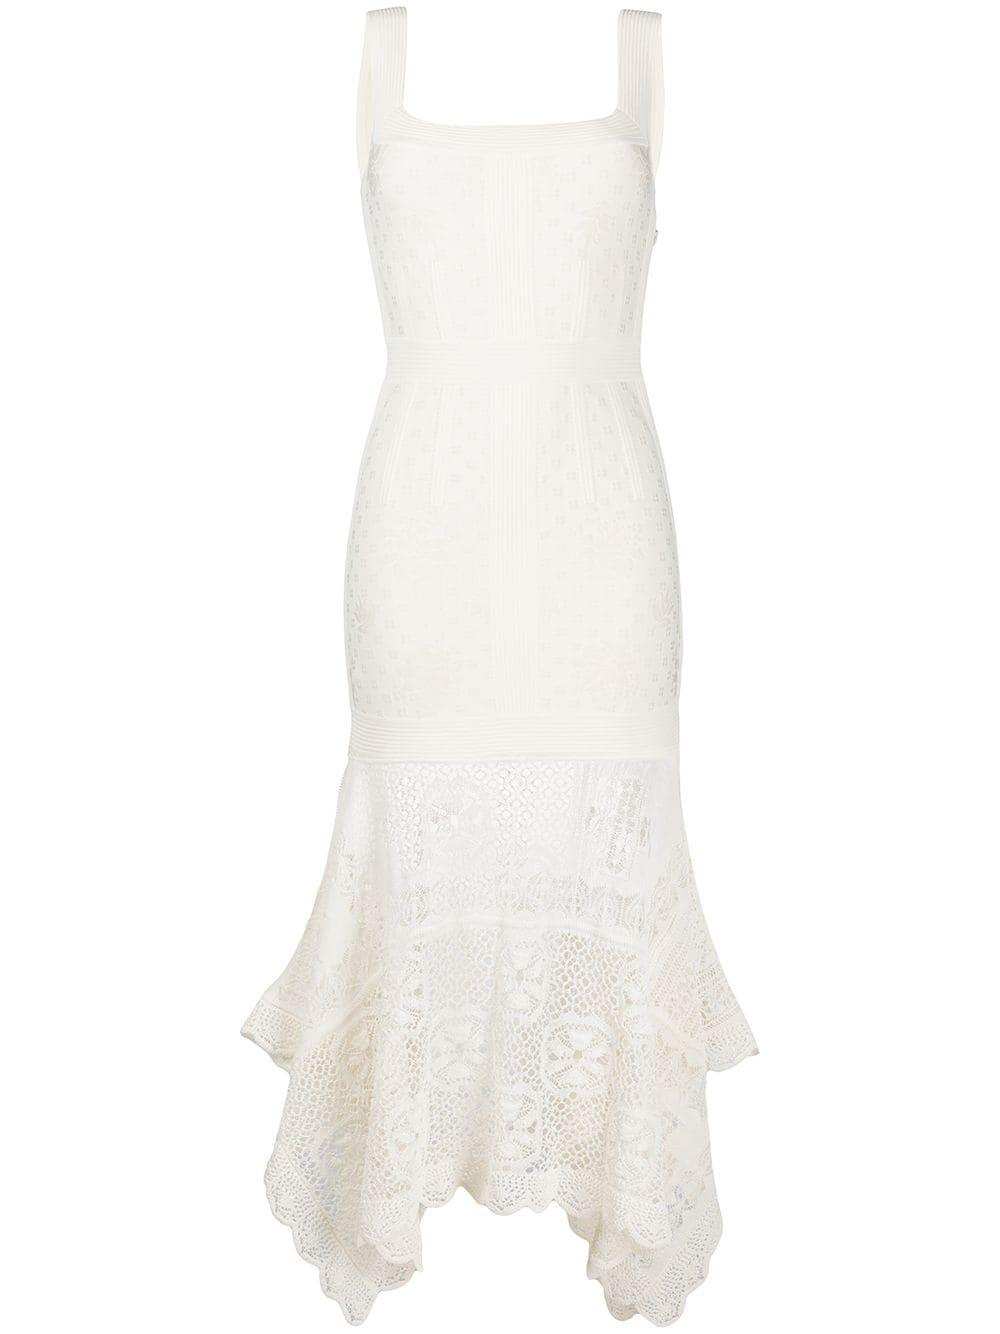 Sleeveless Dress With Lace Handkerchief Bottom